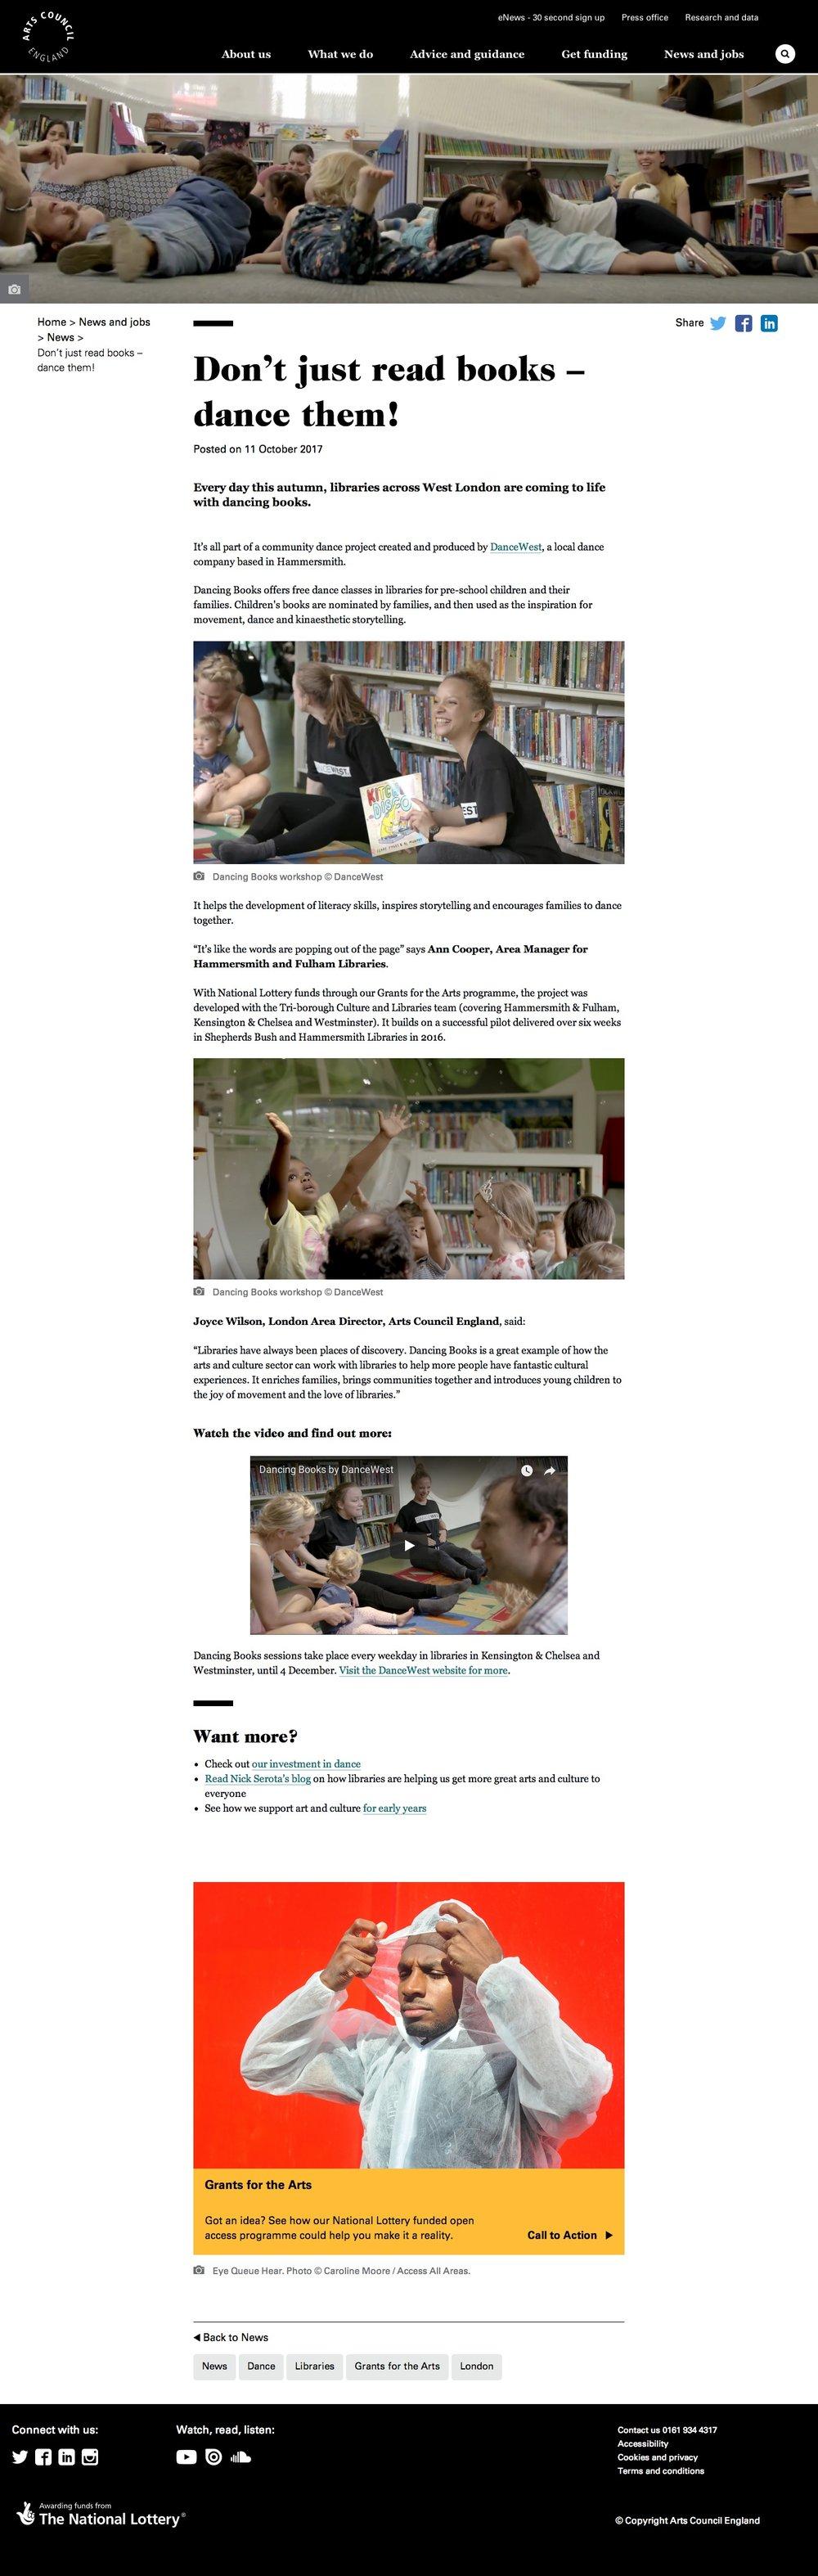 screencapture-artscouncil-org-uk-news-don-E2-80-99t-just-read-books-E2-80-93-dance-them-1508412830282-2.jpg